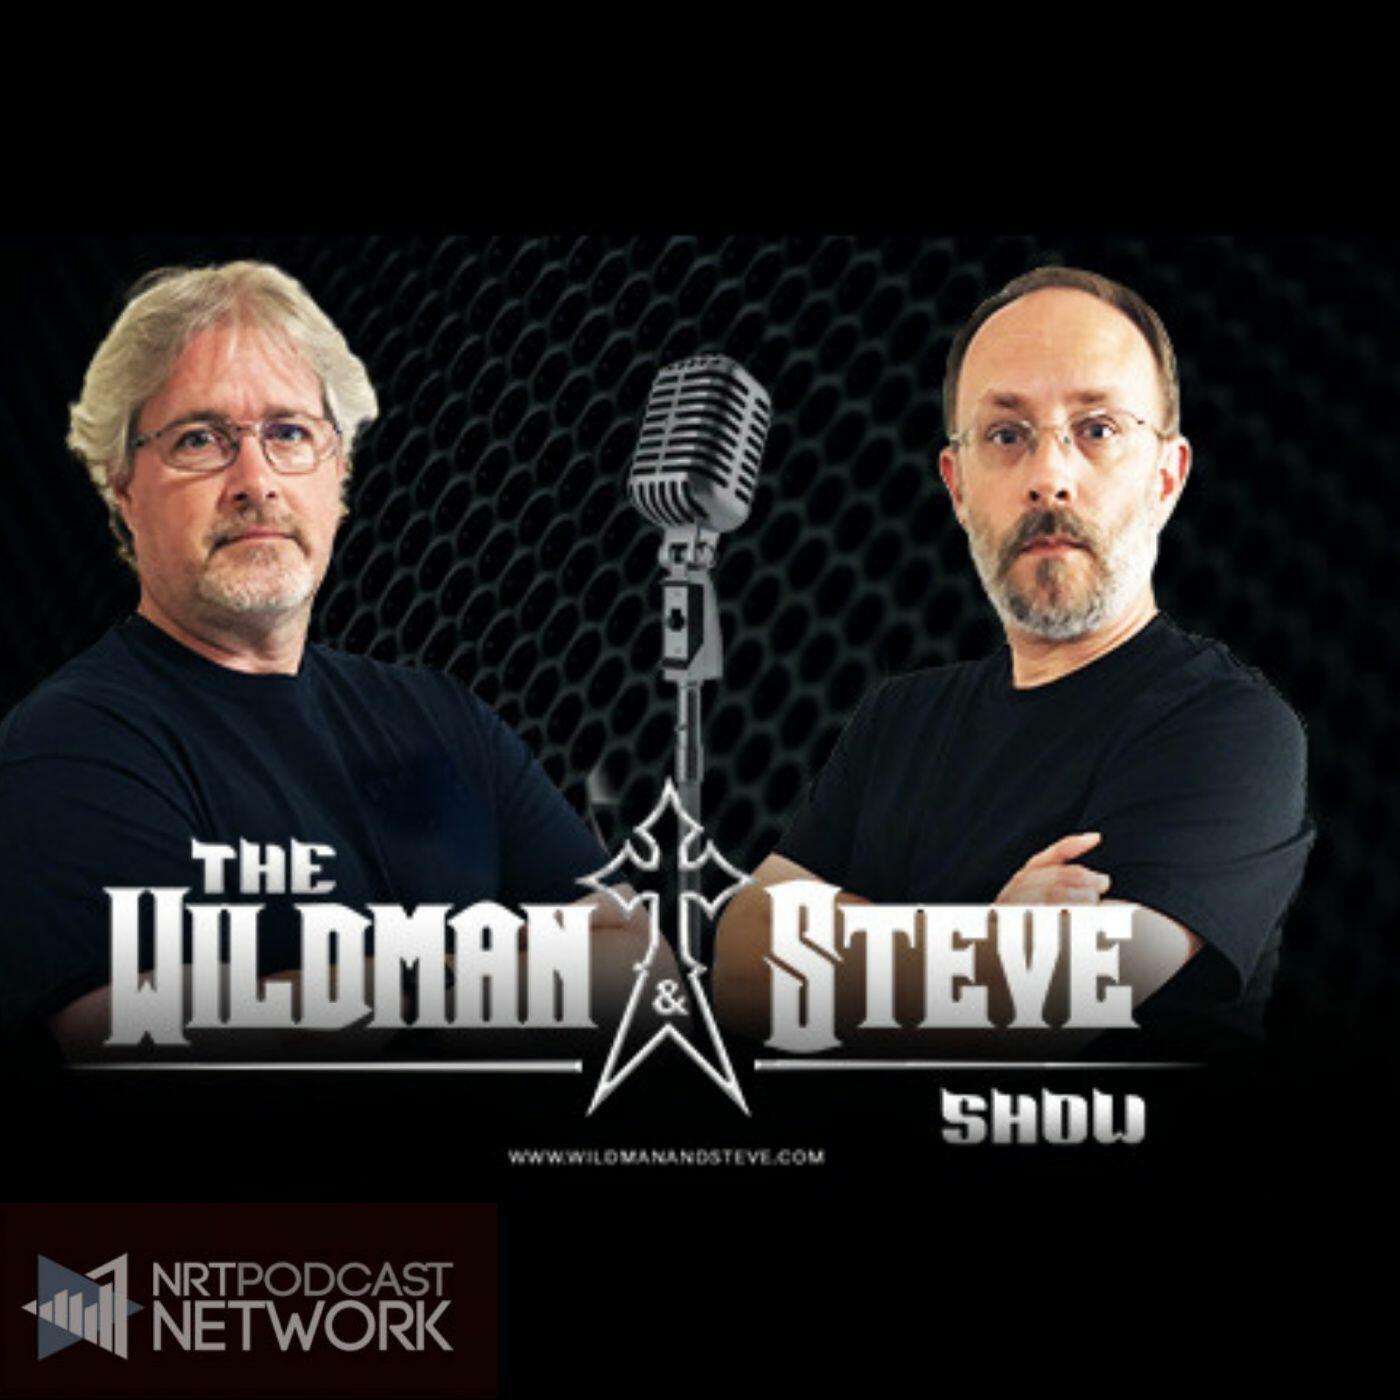 The Wildman & Steve Show